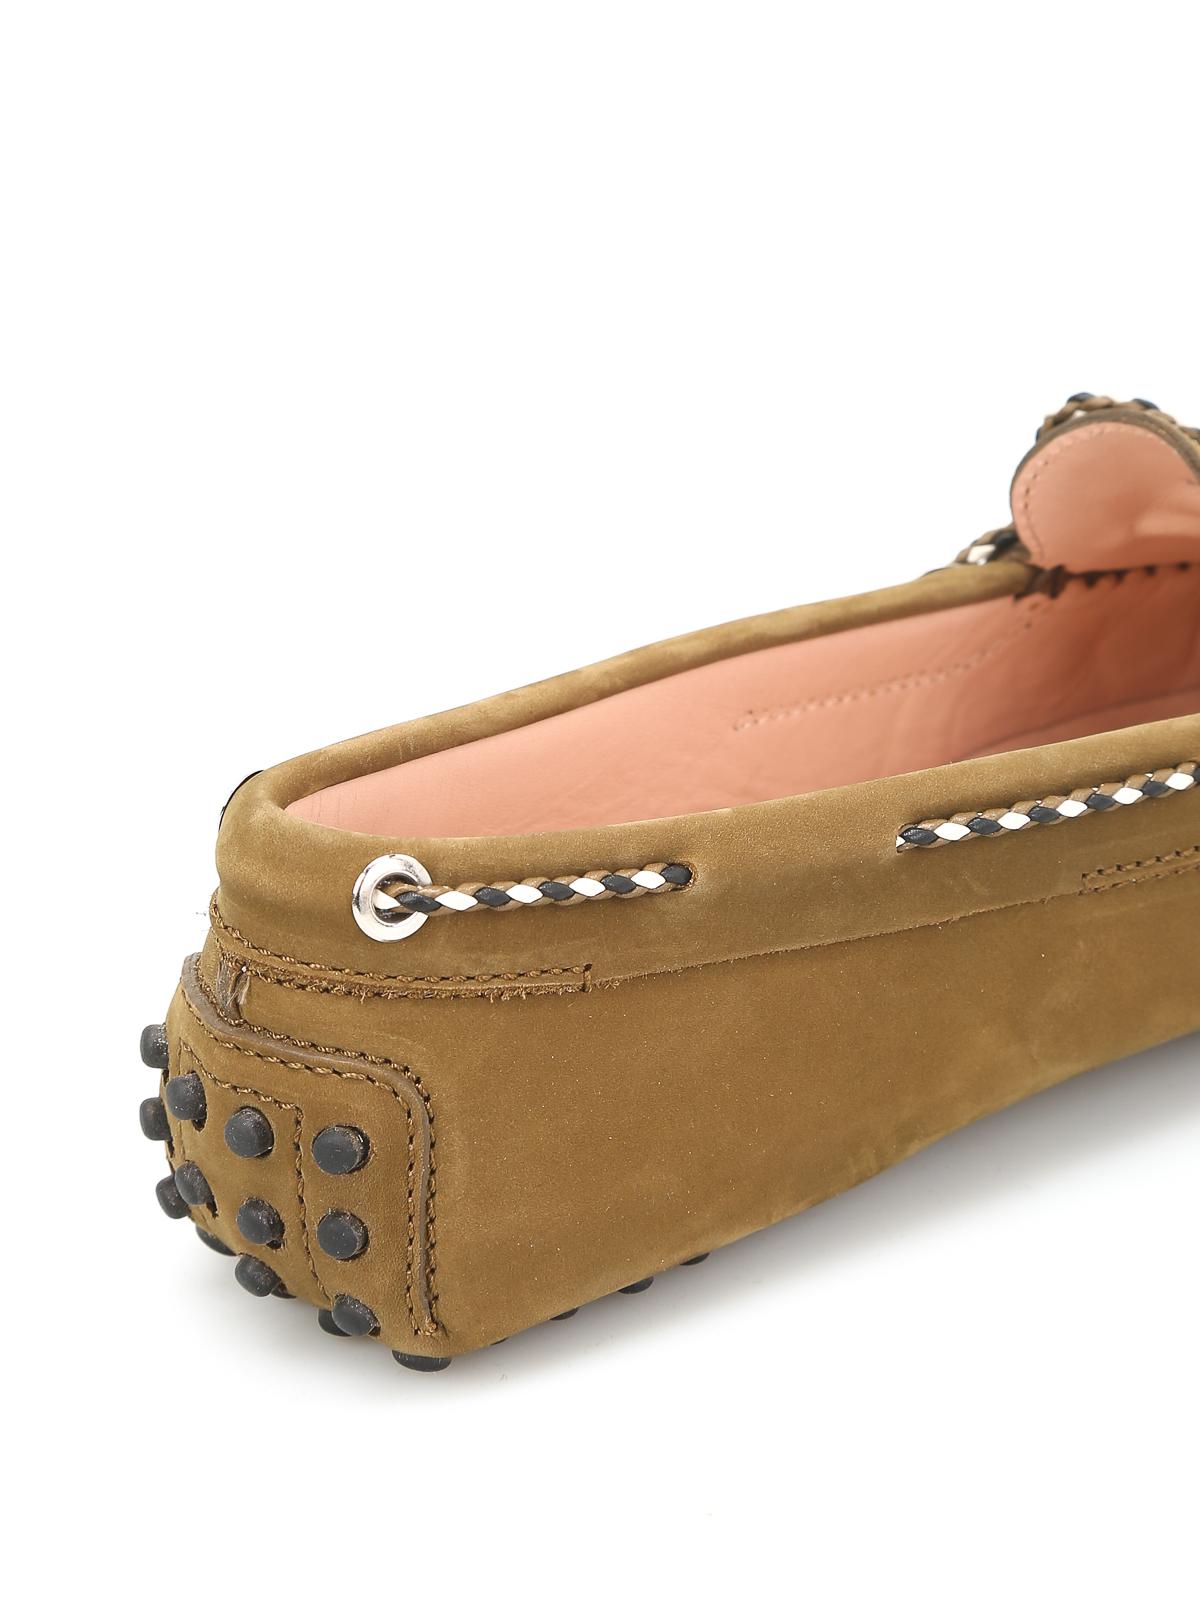 3b2ea2a4751c4 scooby-doo-nubuck-loafers-shop-online-tods-00000095647f00s014.jpg